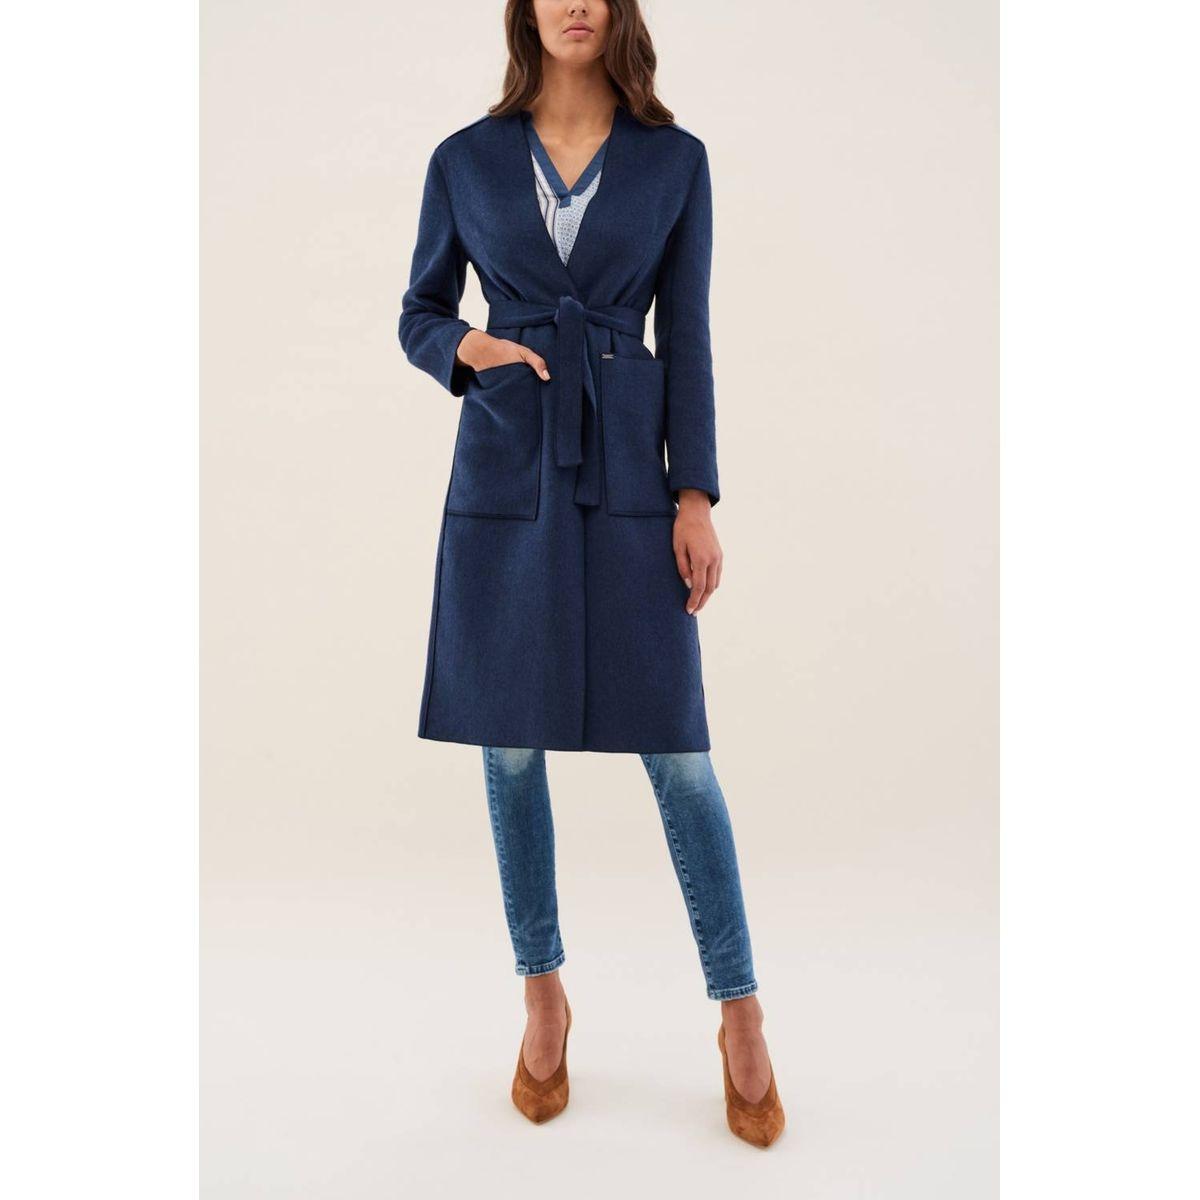 Manteau en étoffe «Hand made» avec ceinture LISBOA